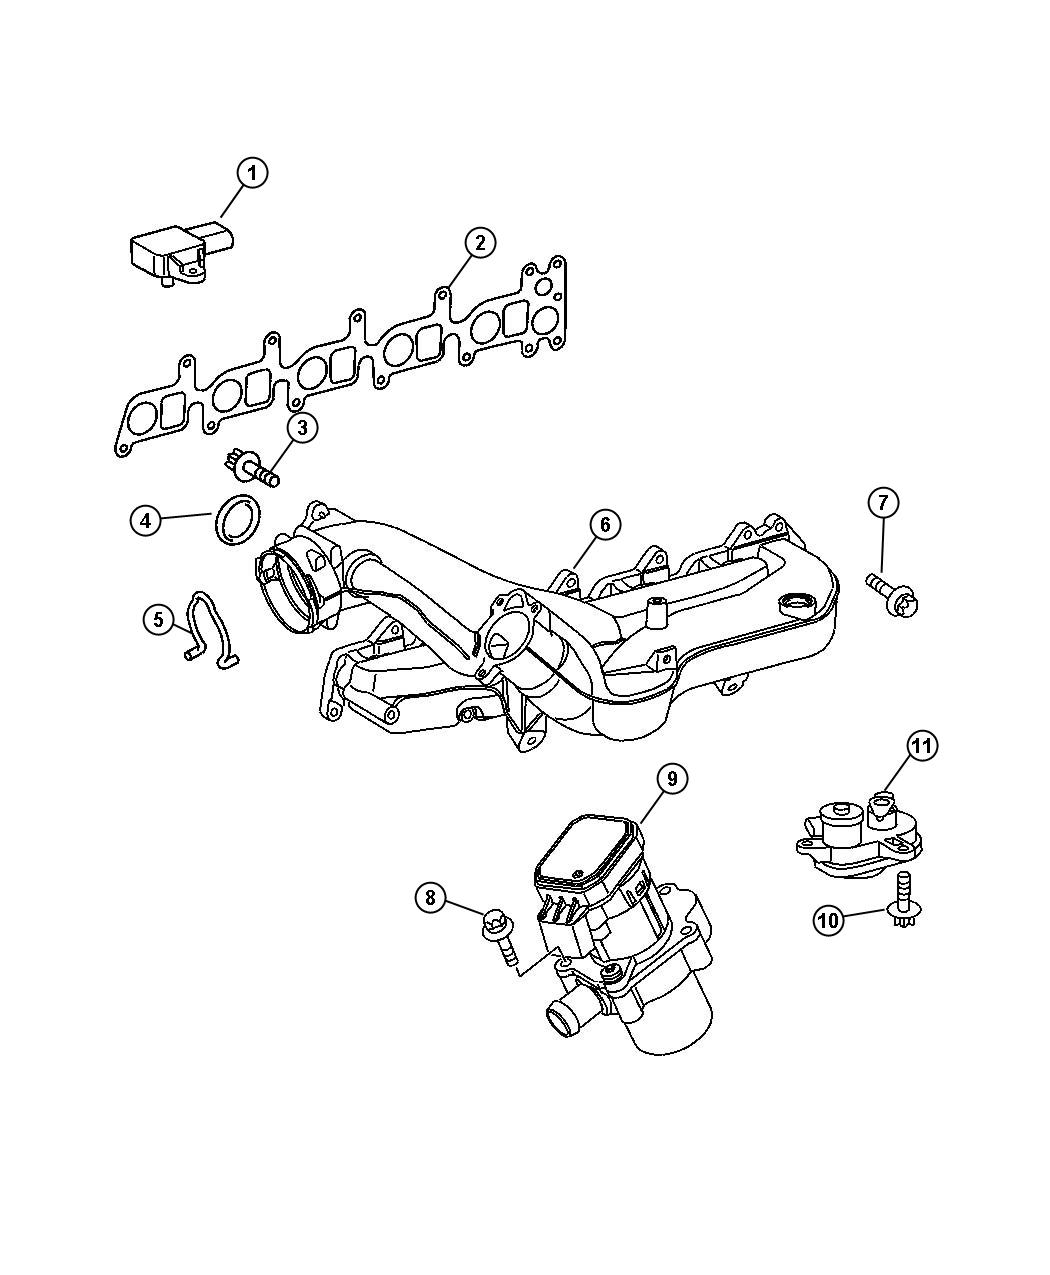 Dodge SPRINTER Sensor. Coolant level. Diesel, manifold